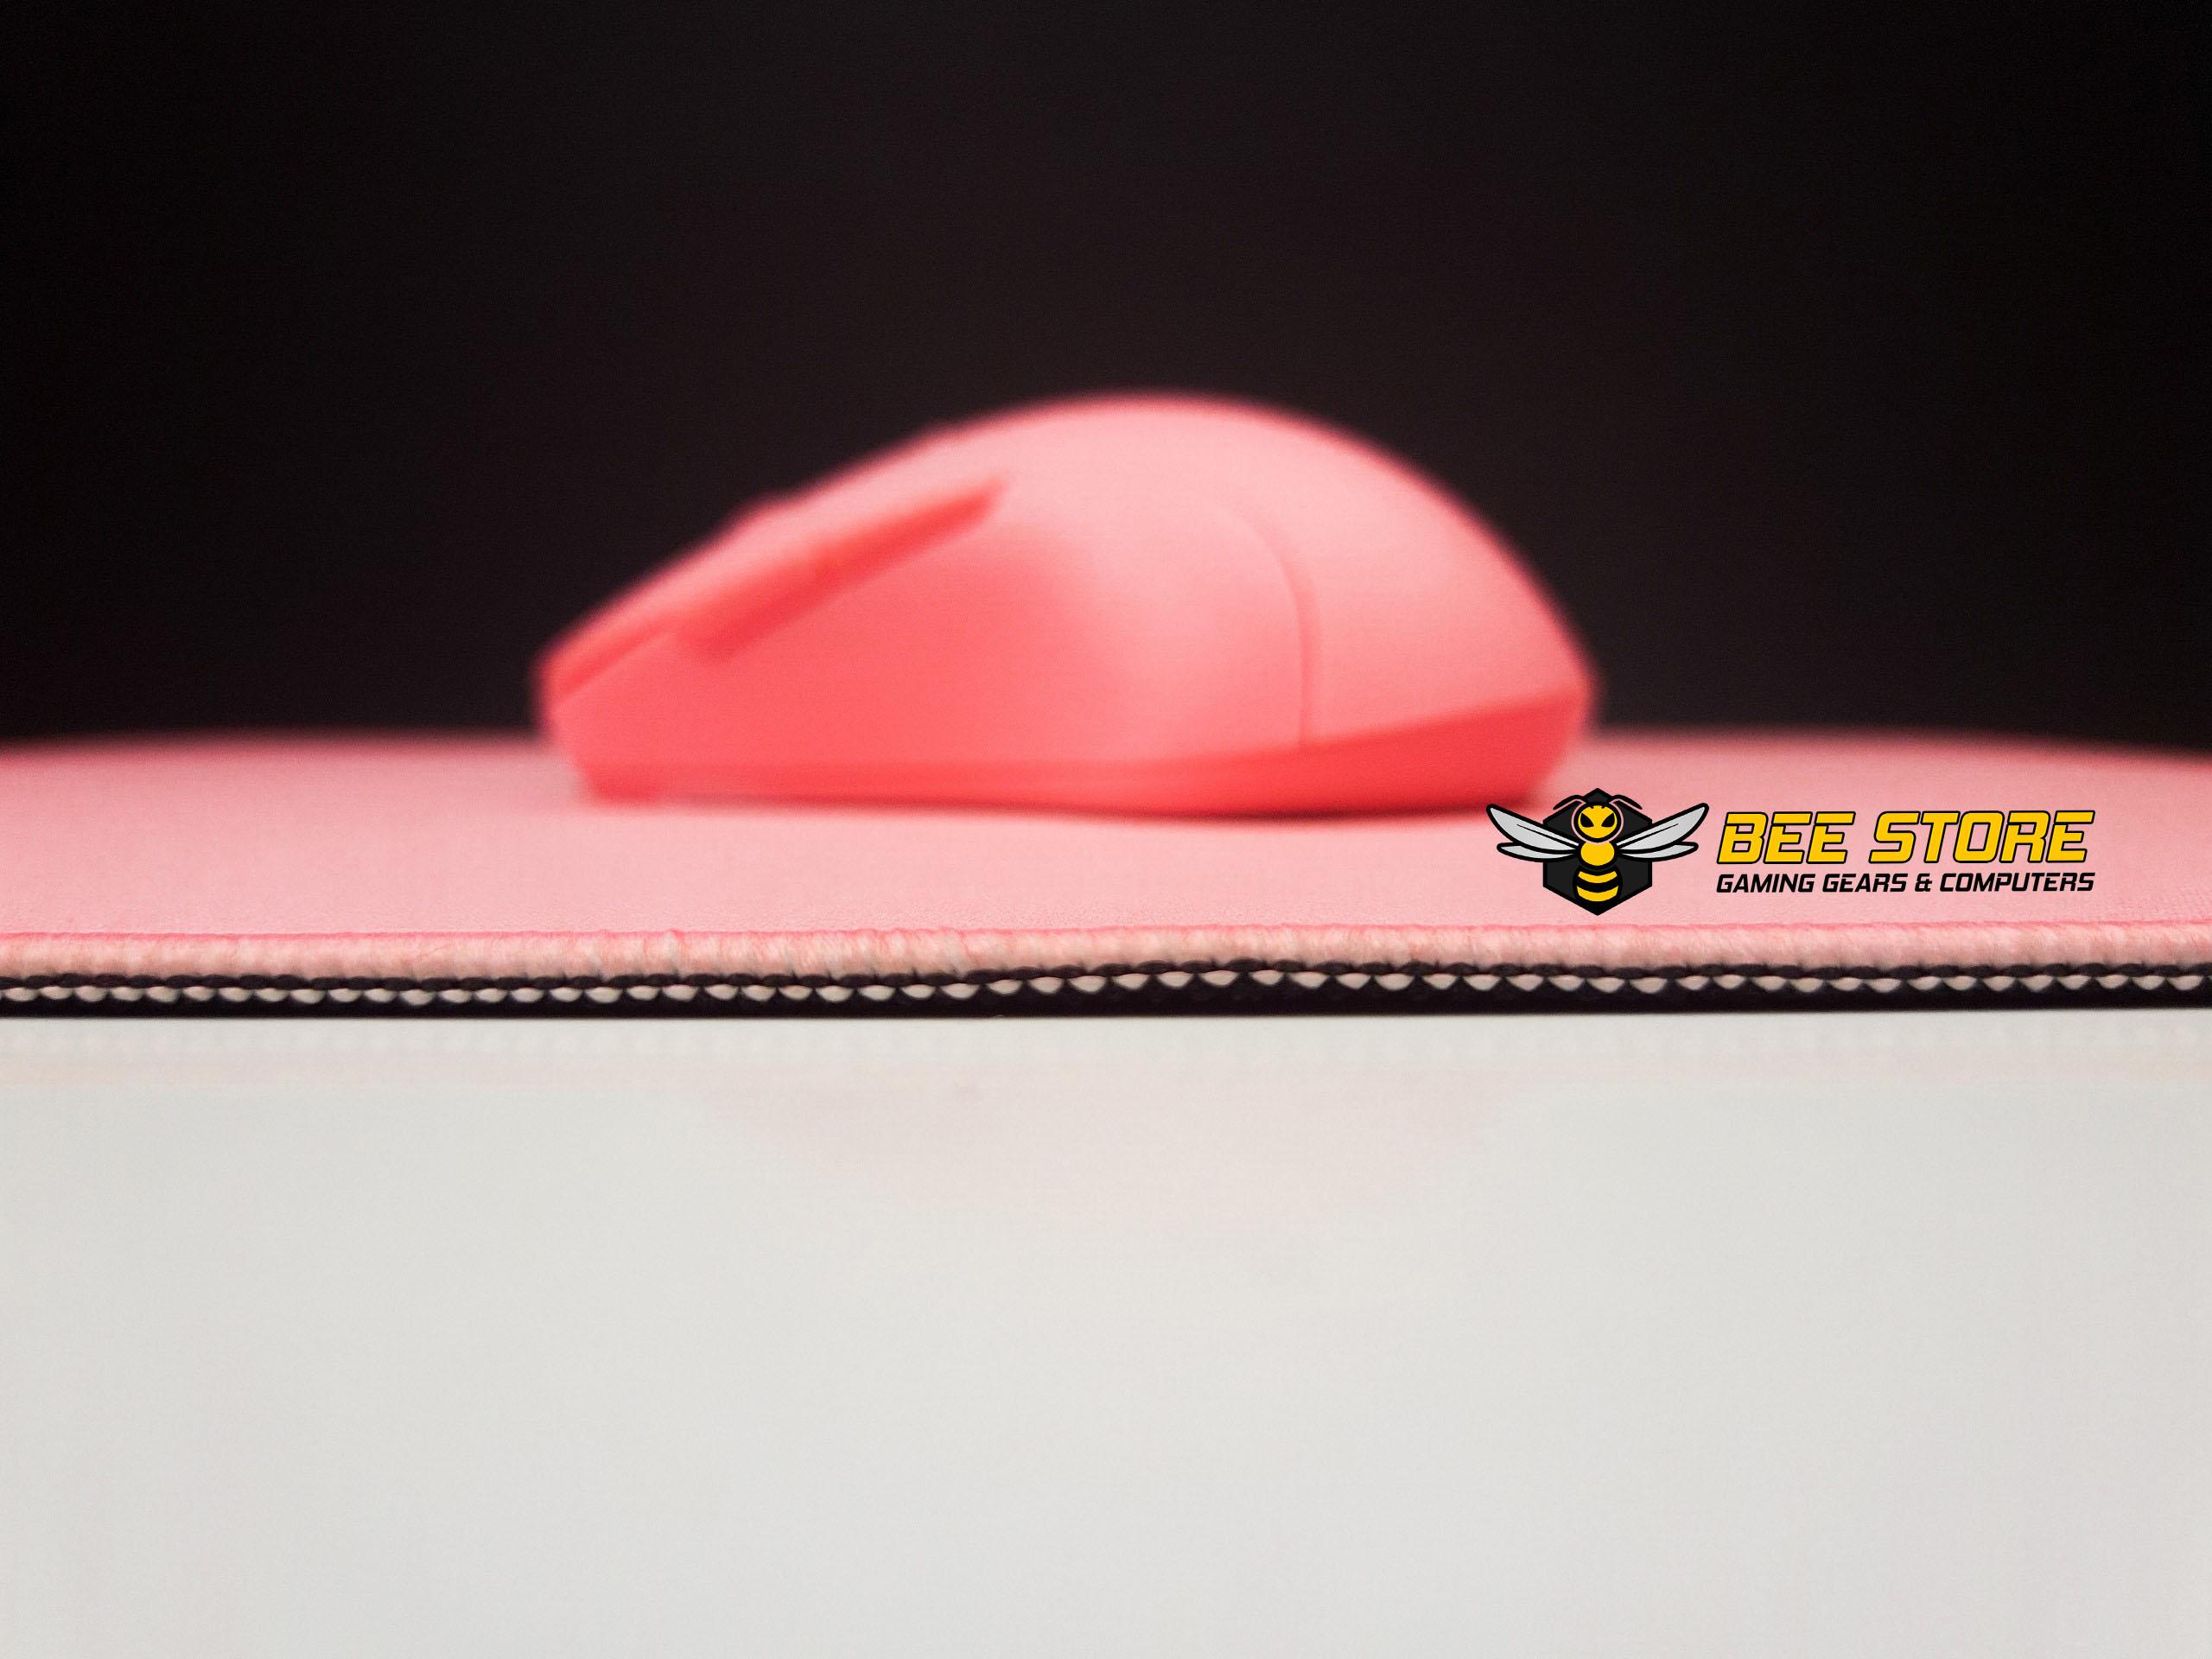 ban-di-chuot-akko-color-size-m-pink-beegaming-20